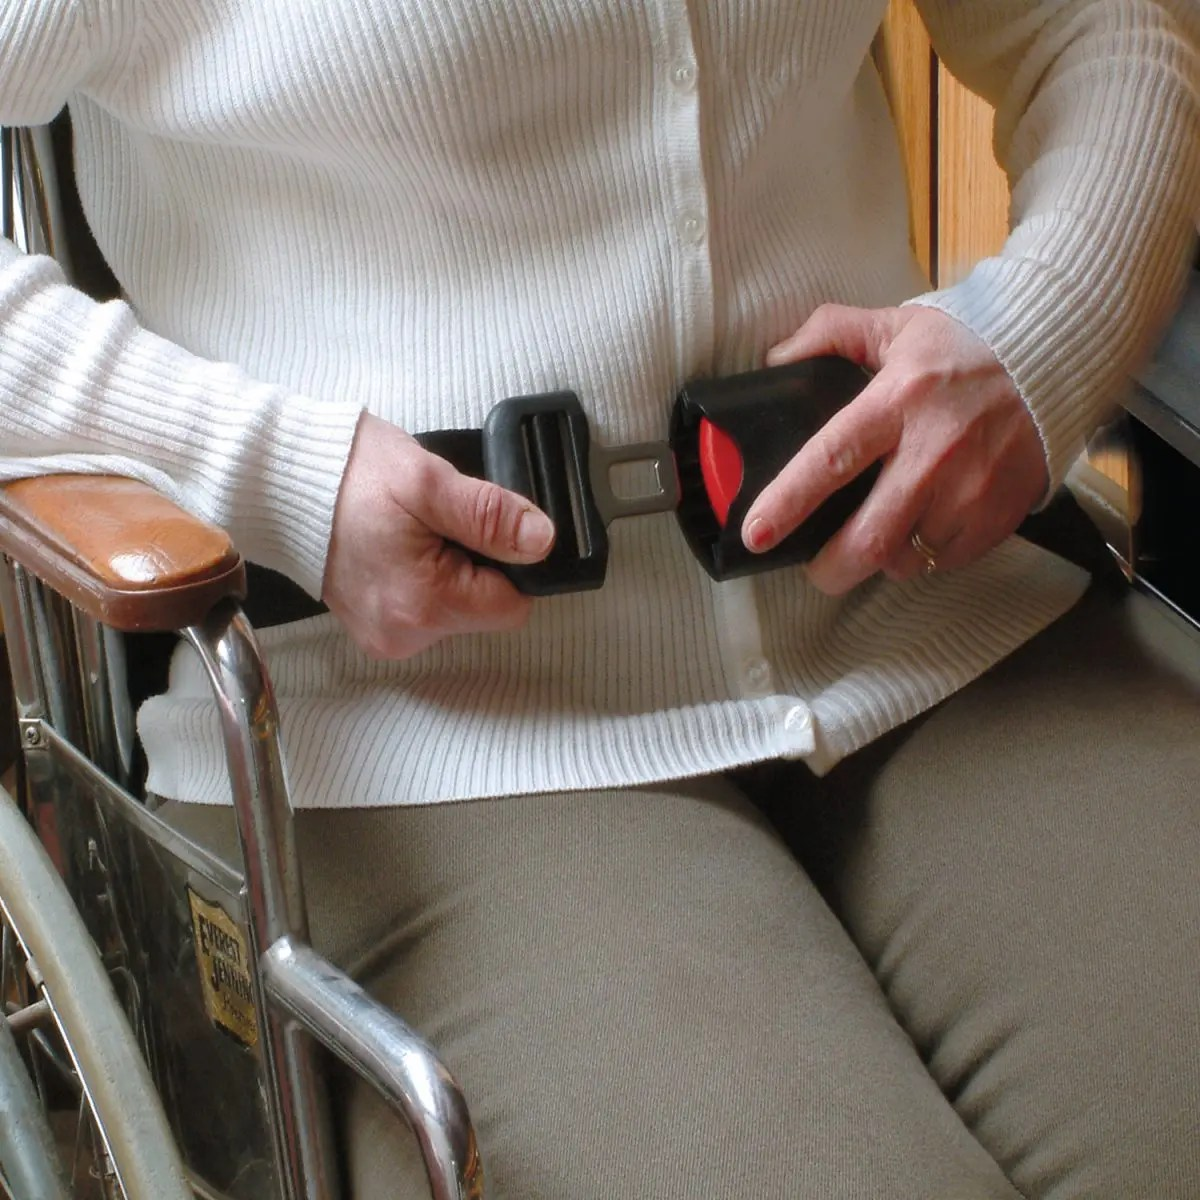 wheelchair seat belt best fitness ball chair easy release alarm tl 2109 castle